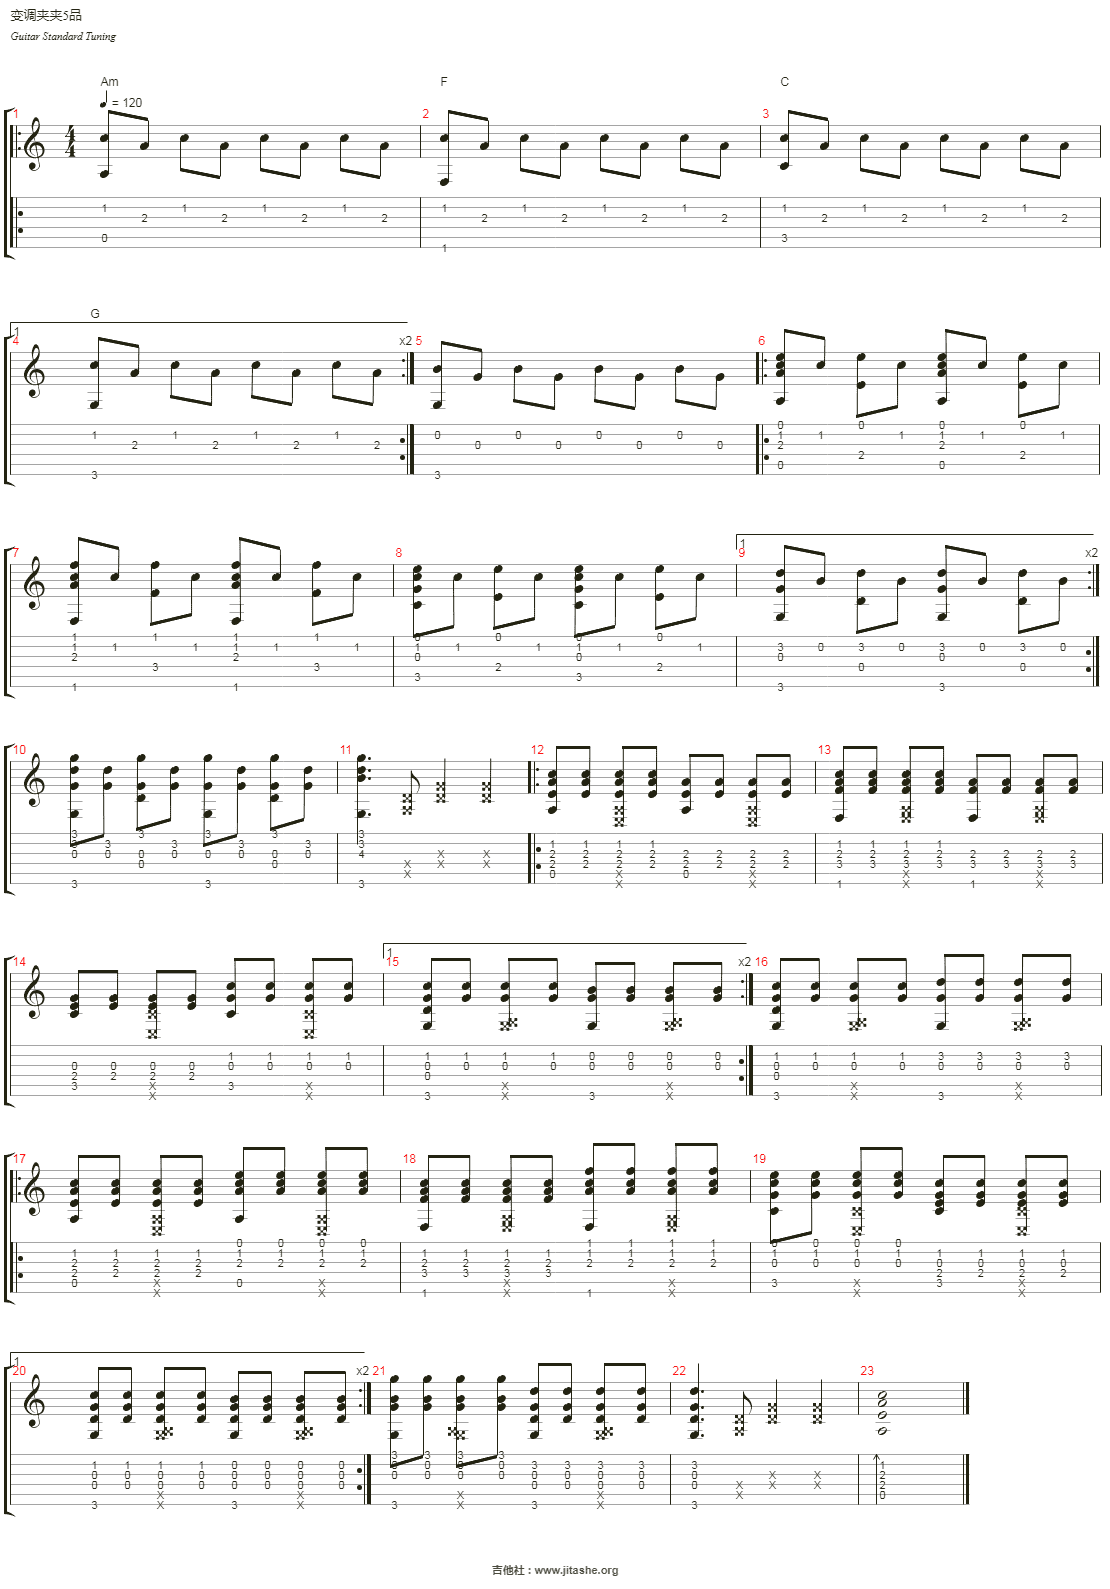 Breath and Life吉他谱(音轨 1)_AudioMachine